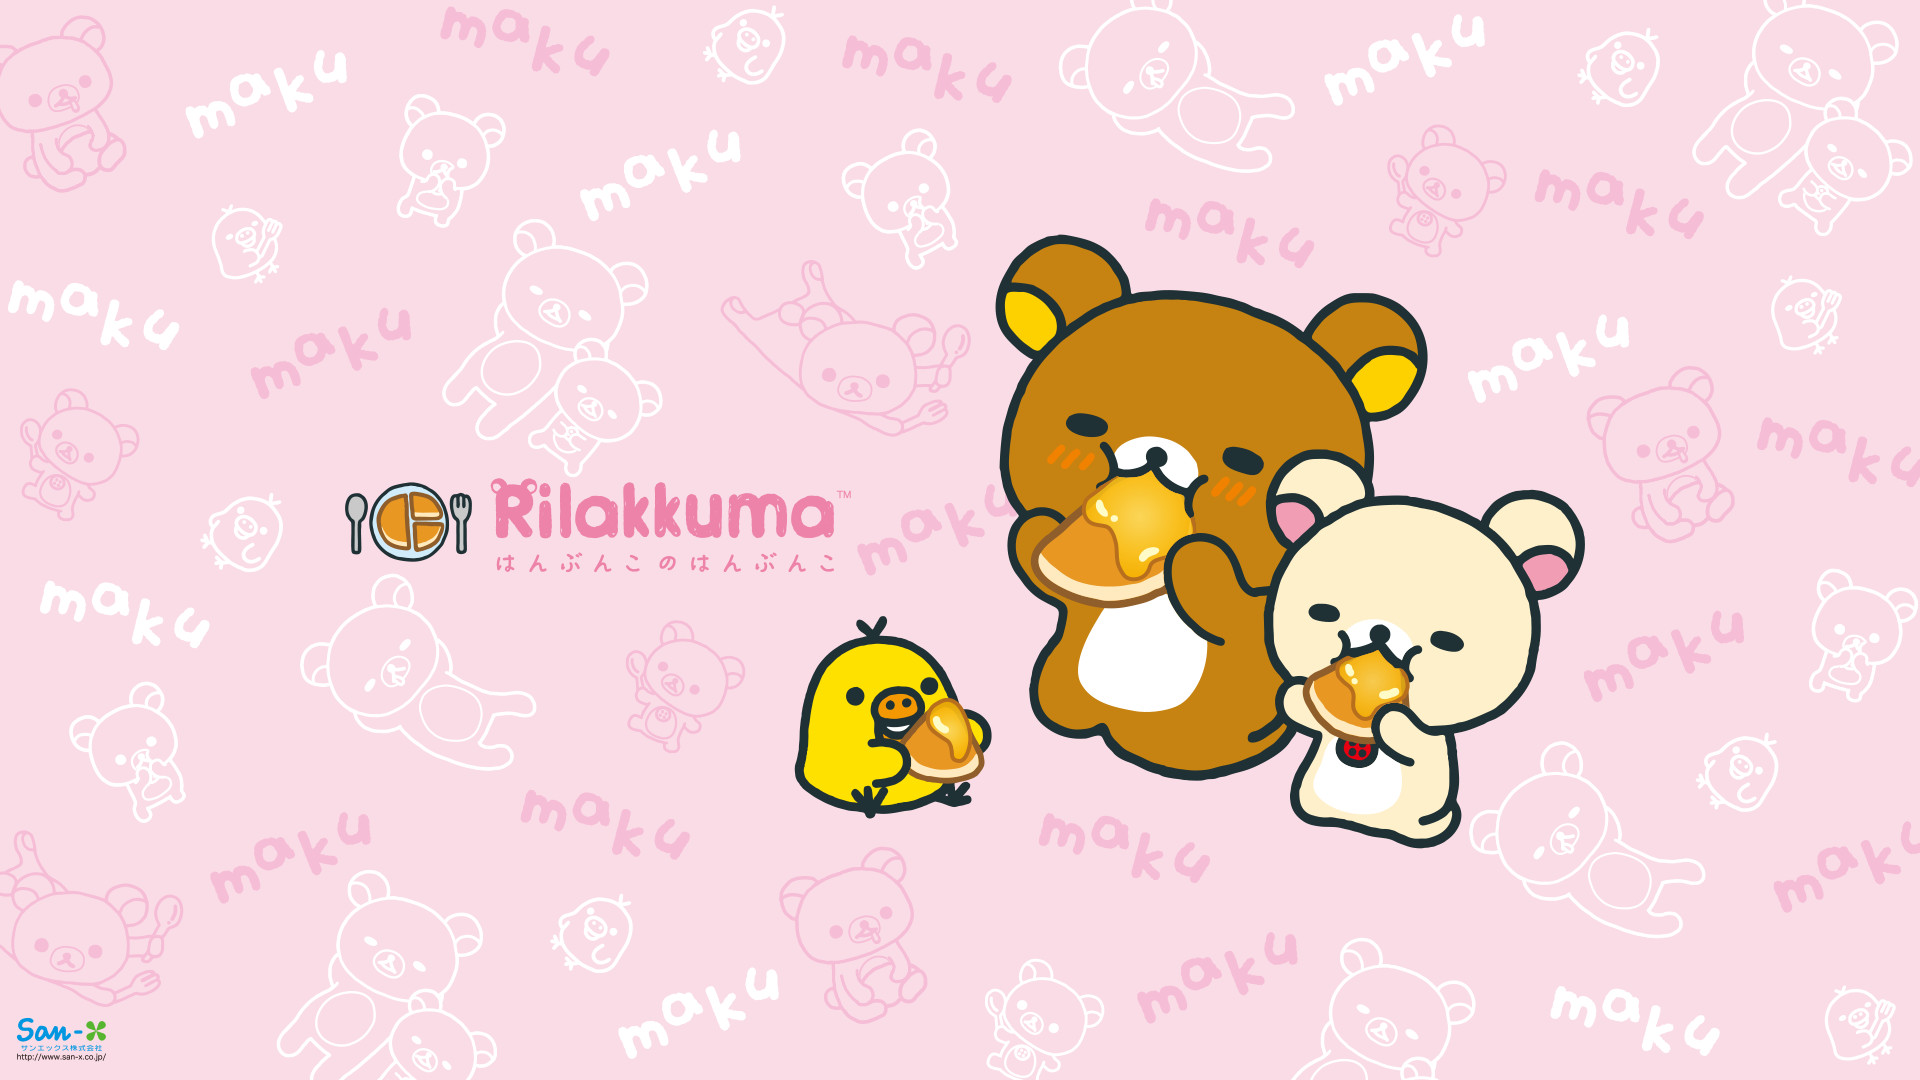 80_1080_1920.png 1,920×1,080 pixels   BG/Wallpaper/Pattern   Pinterest    Rilakkuma, Rilakkuma wallpaper and Sanrio